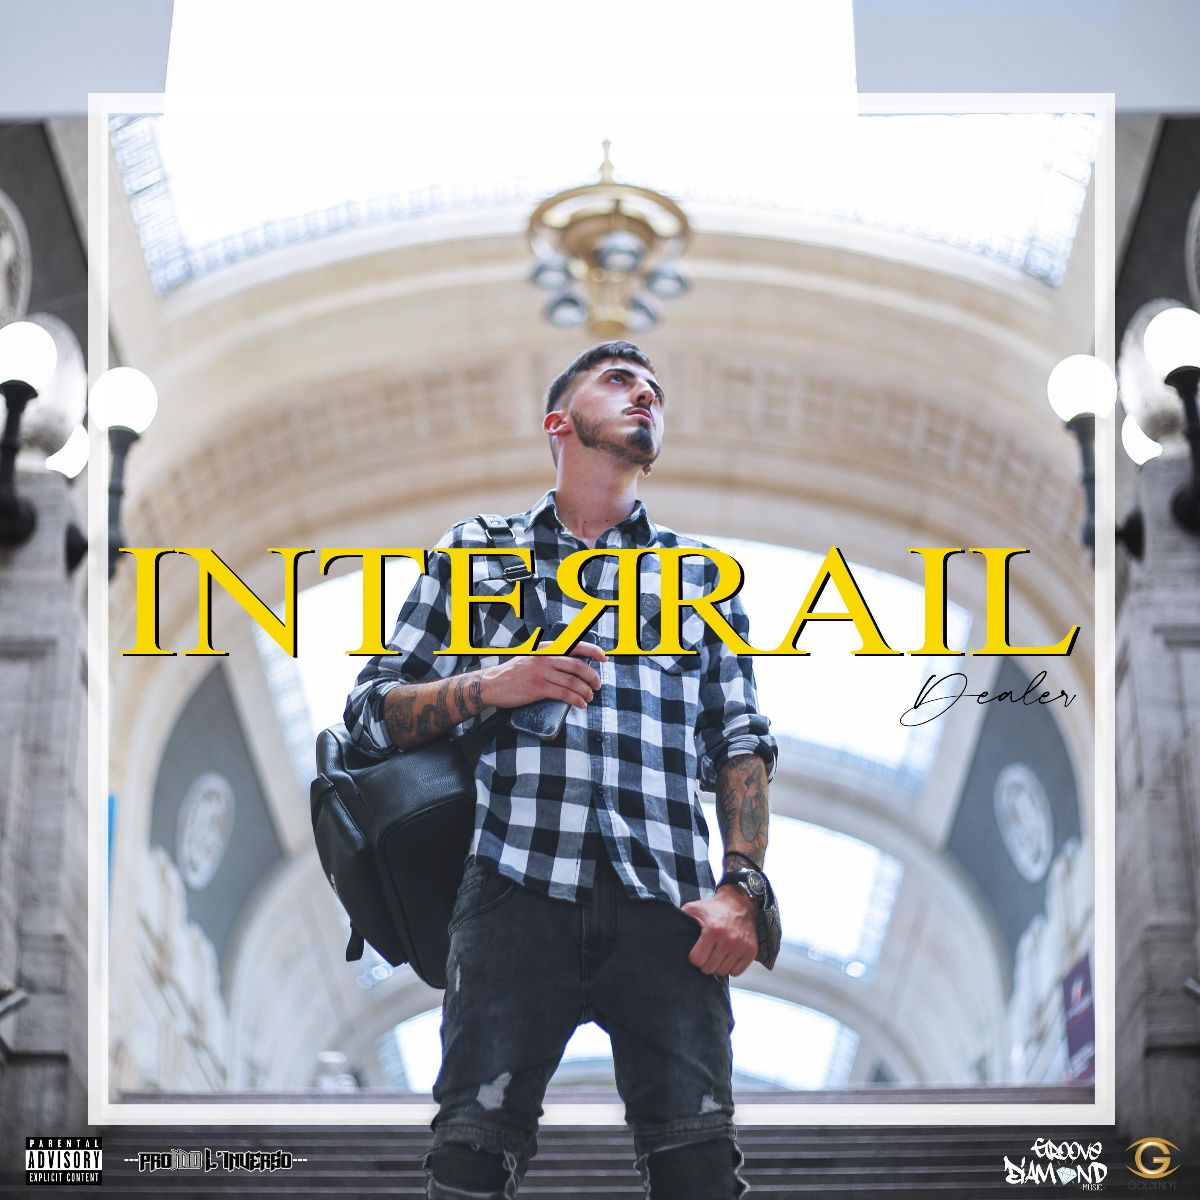 dealer interrail